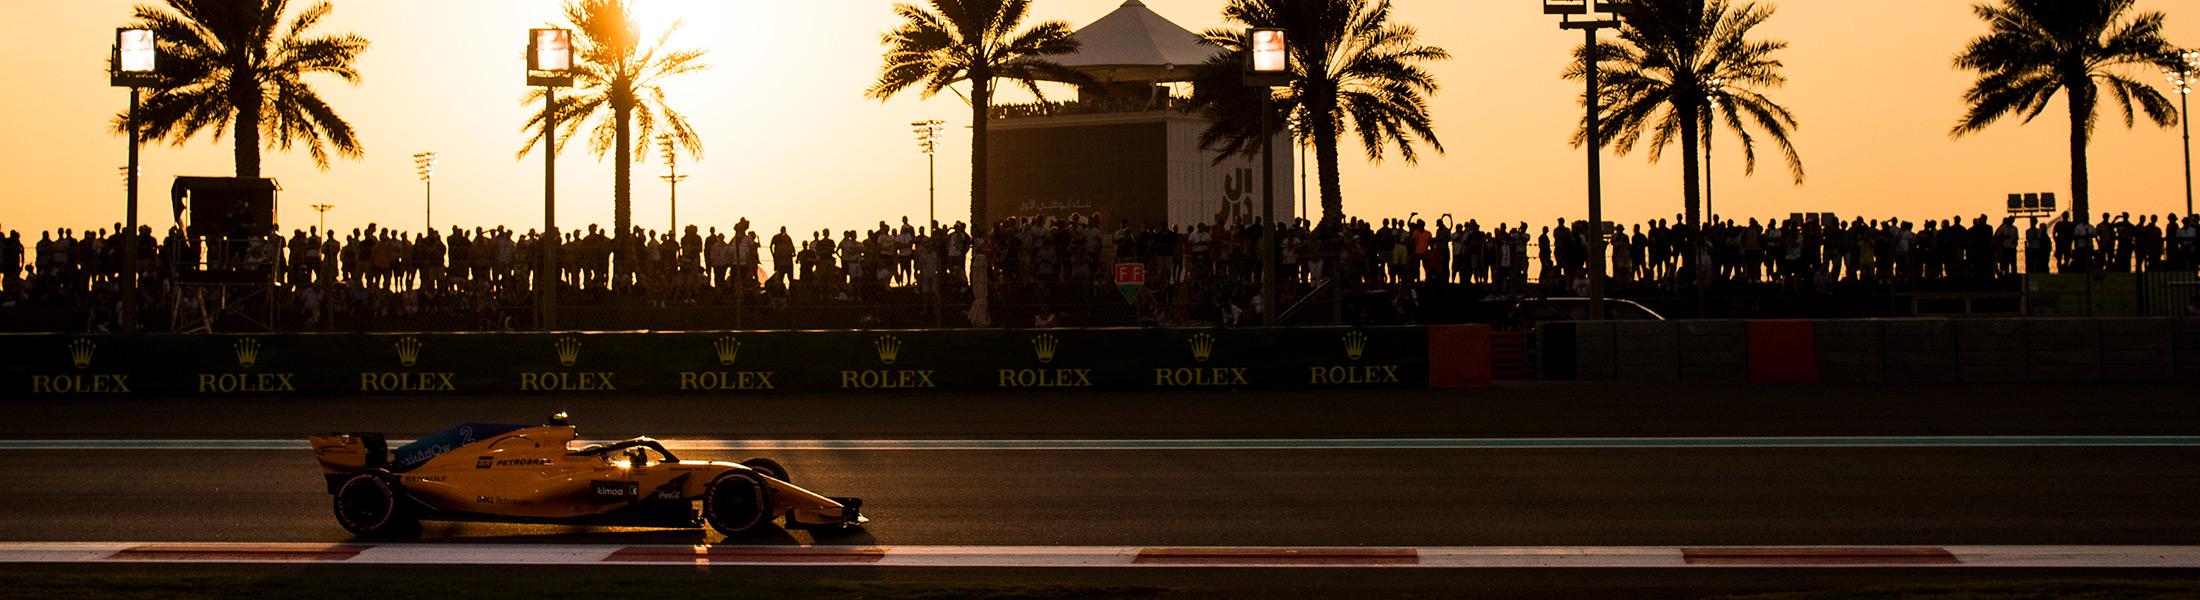 Yas Marina Sunset at the Etihad Abu Dhabi Formula 1 Grand Prix